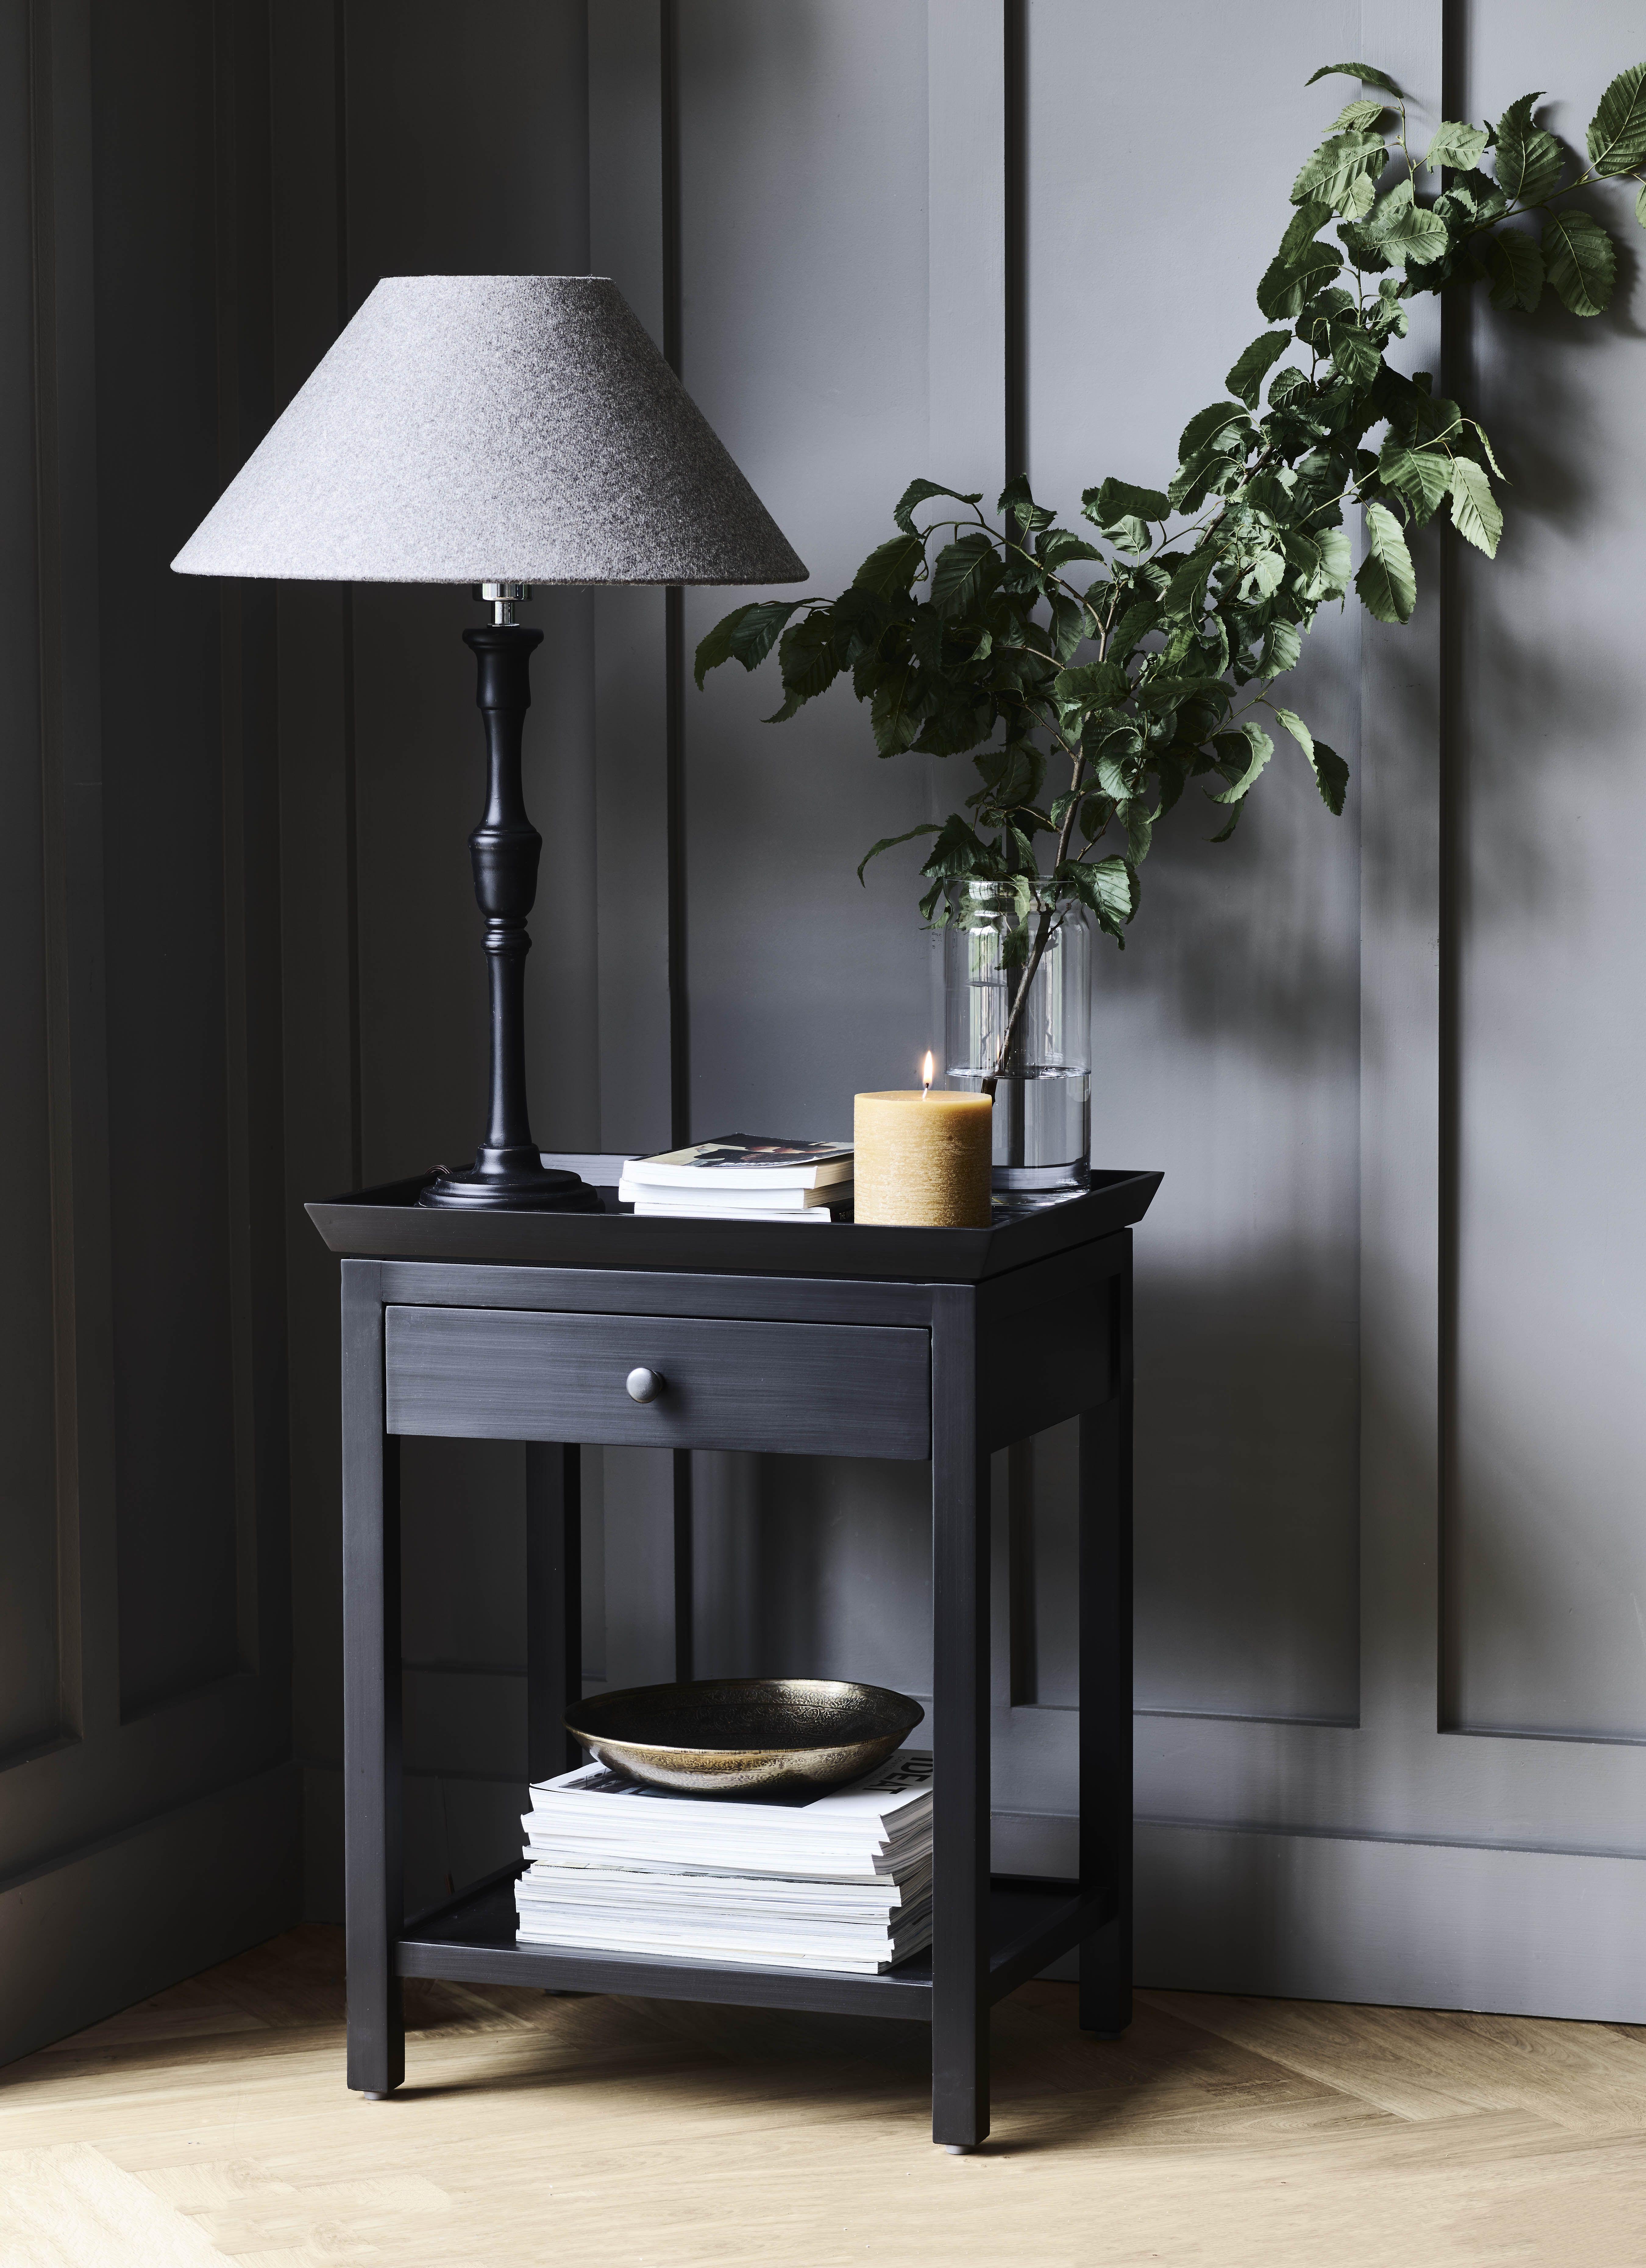 Aldwych Tall Black Side Table Neptune Bedside Table Uk Black Bedside Table Bedside Table Design